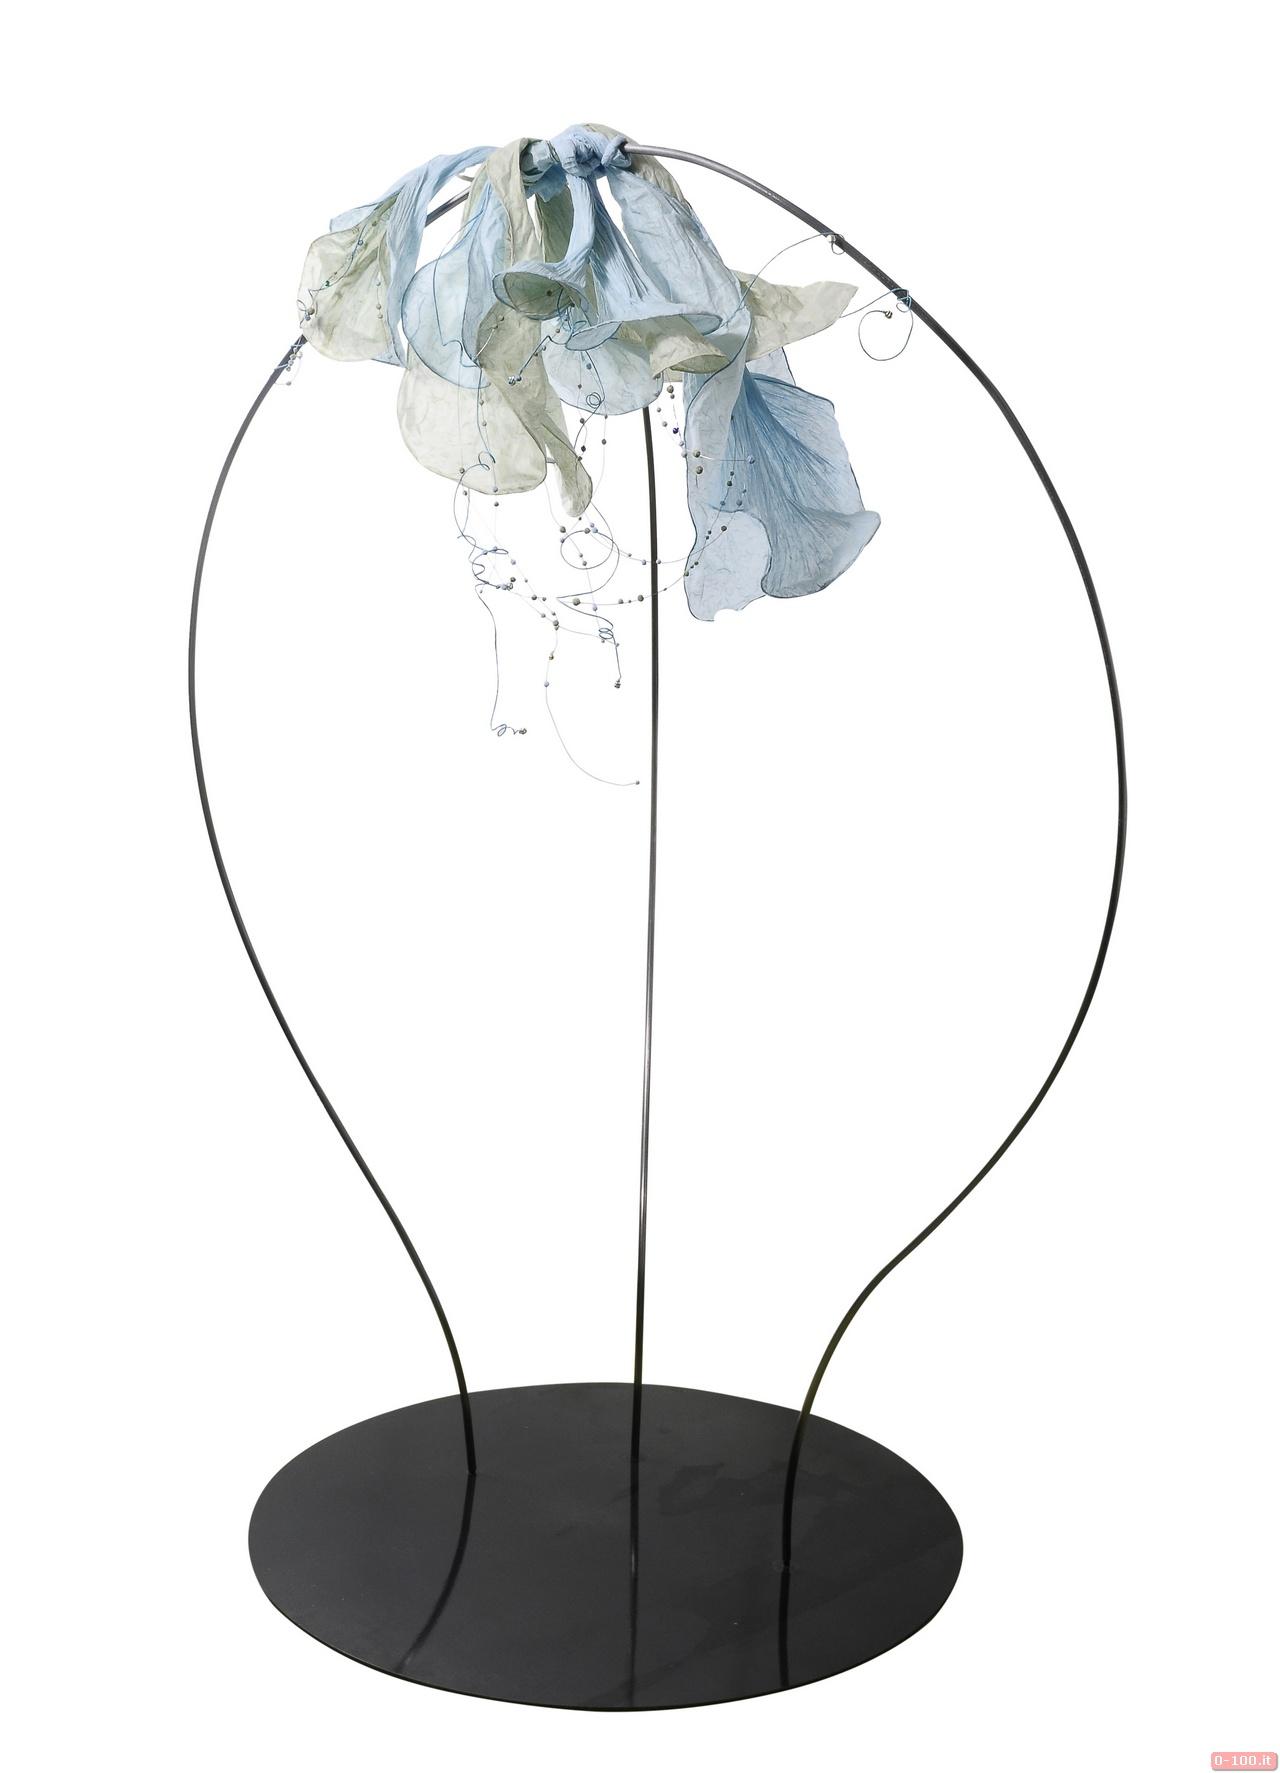 Blooming Creativity_Private Conversation - Esther Farrache _Van Cleef & Arpels_0-100 1